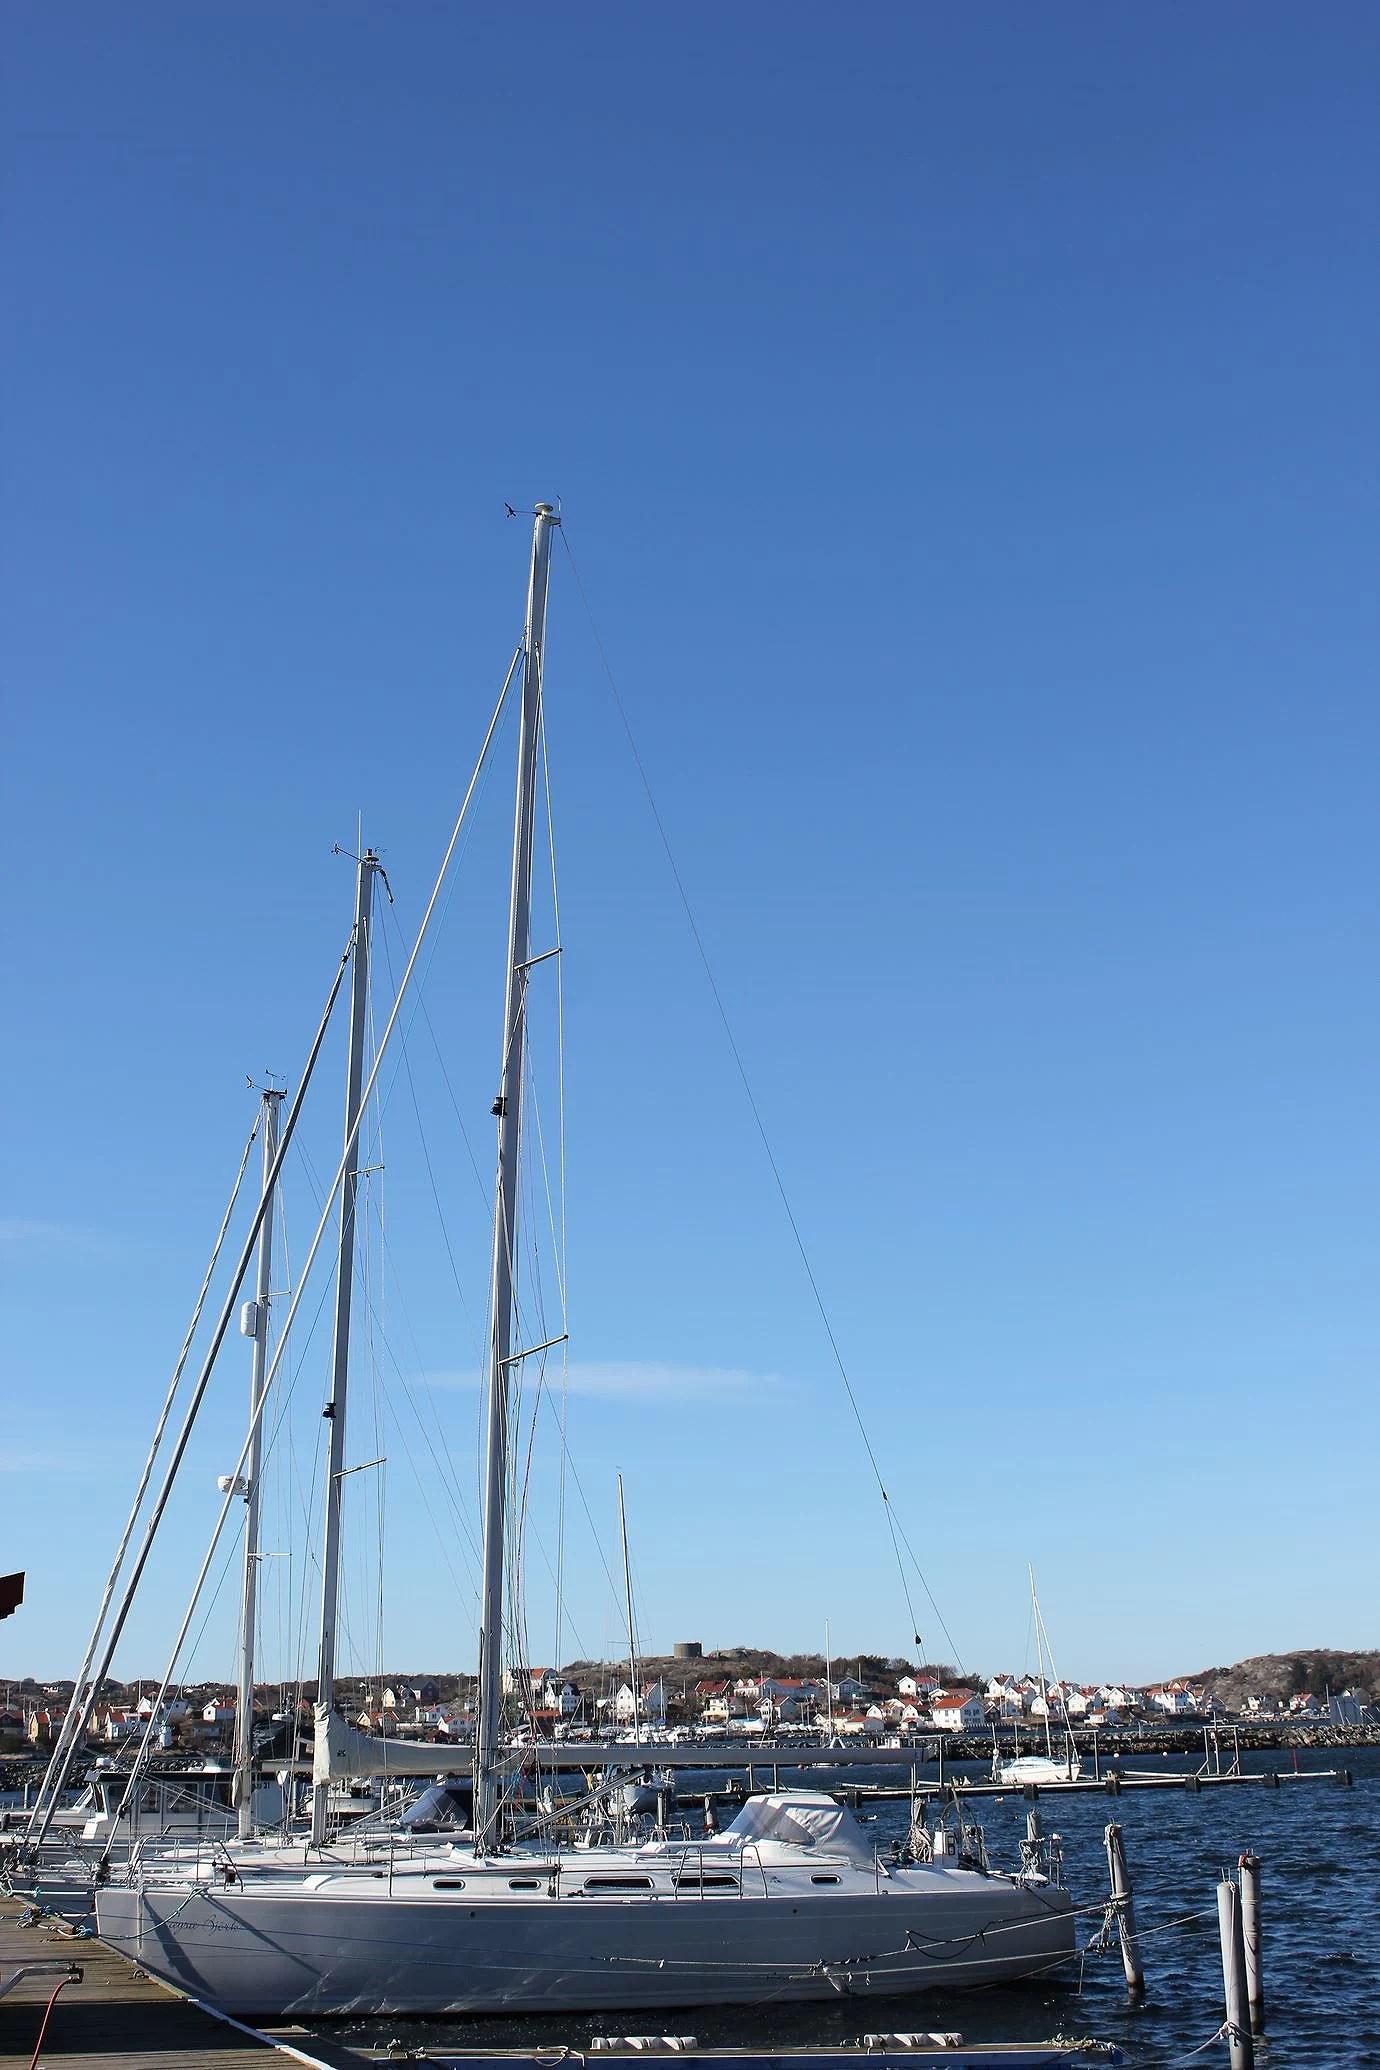 Seaside på Björkö